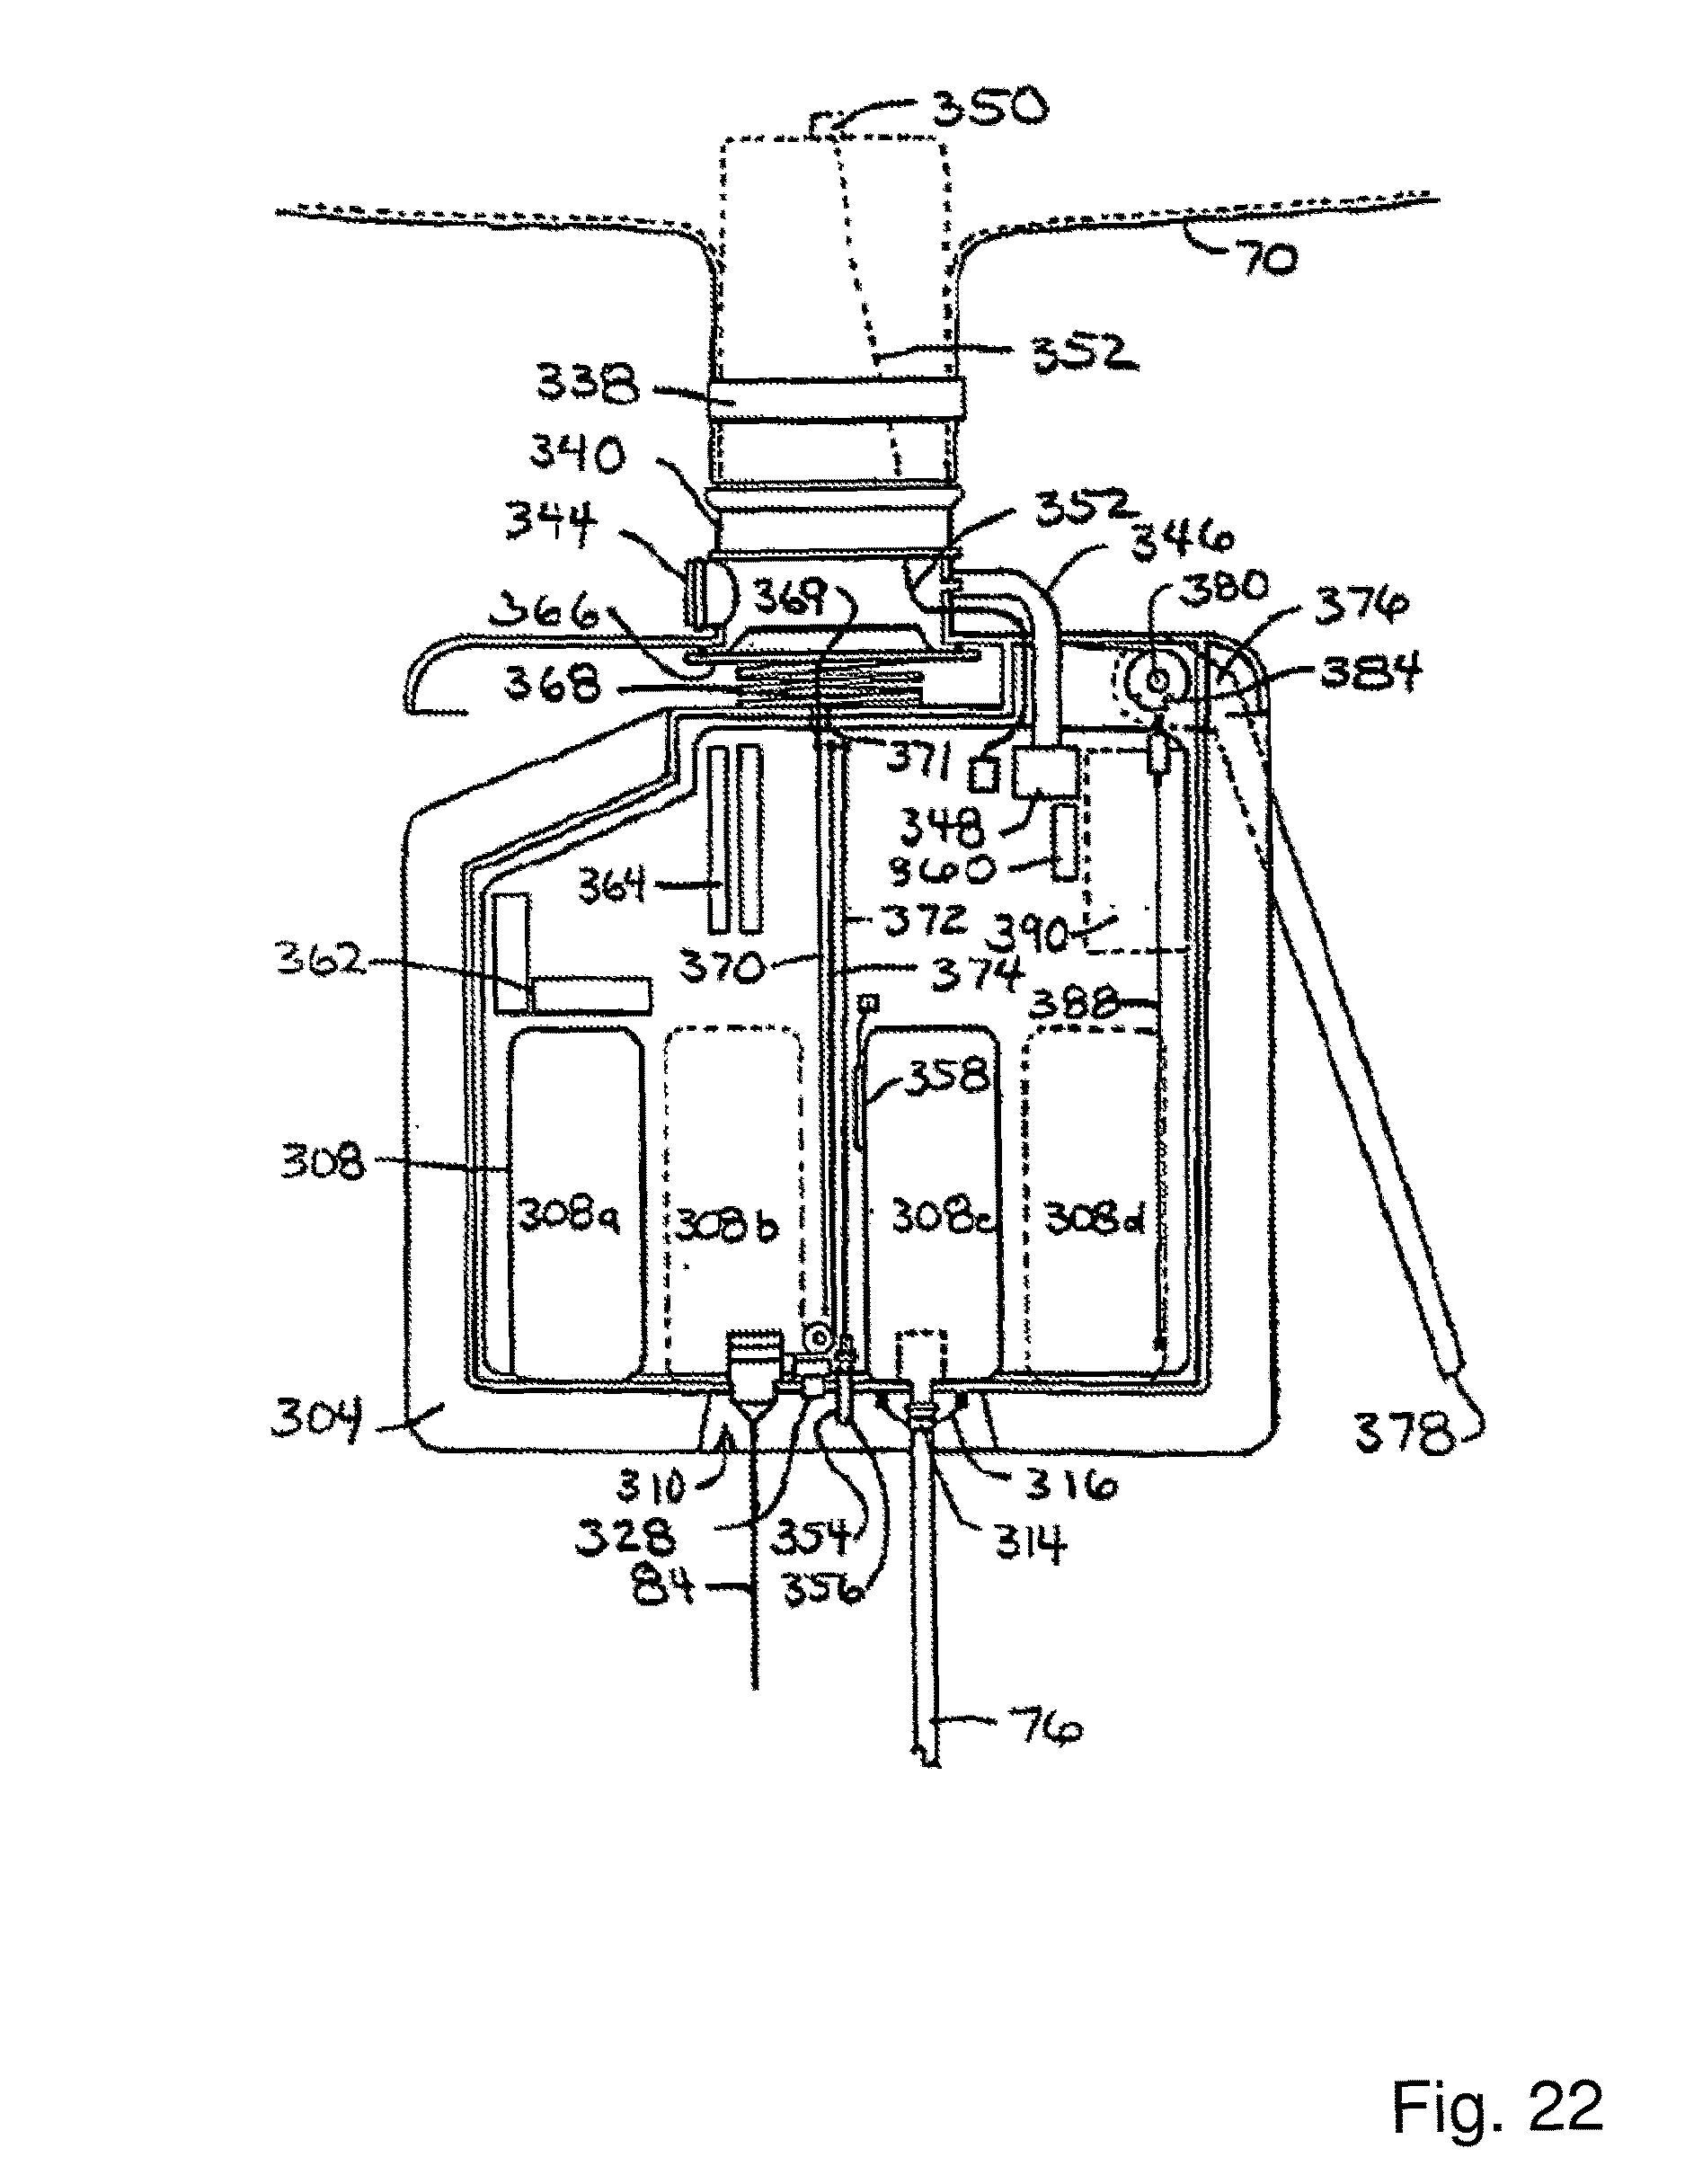 Patent US 9,519,045 B2